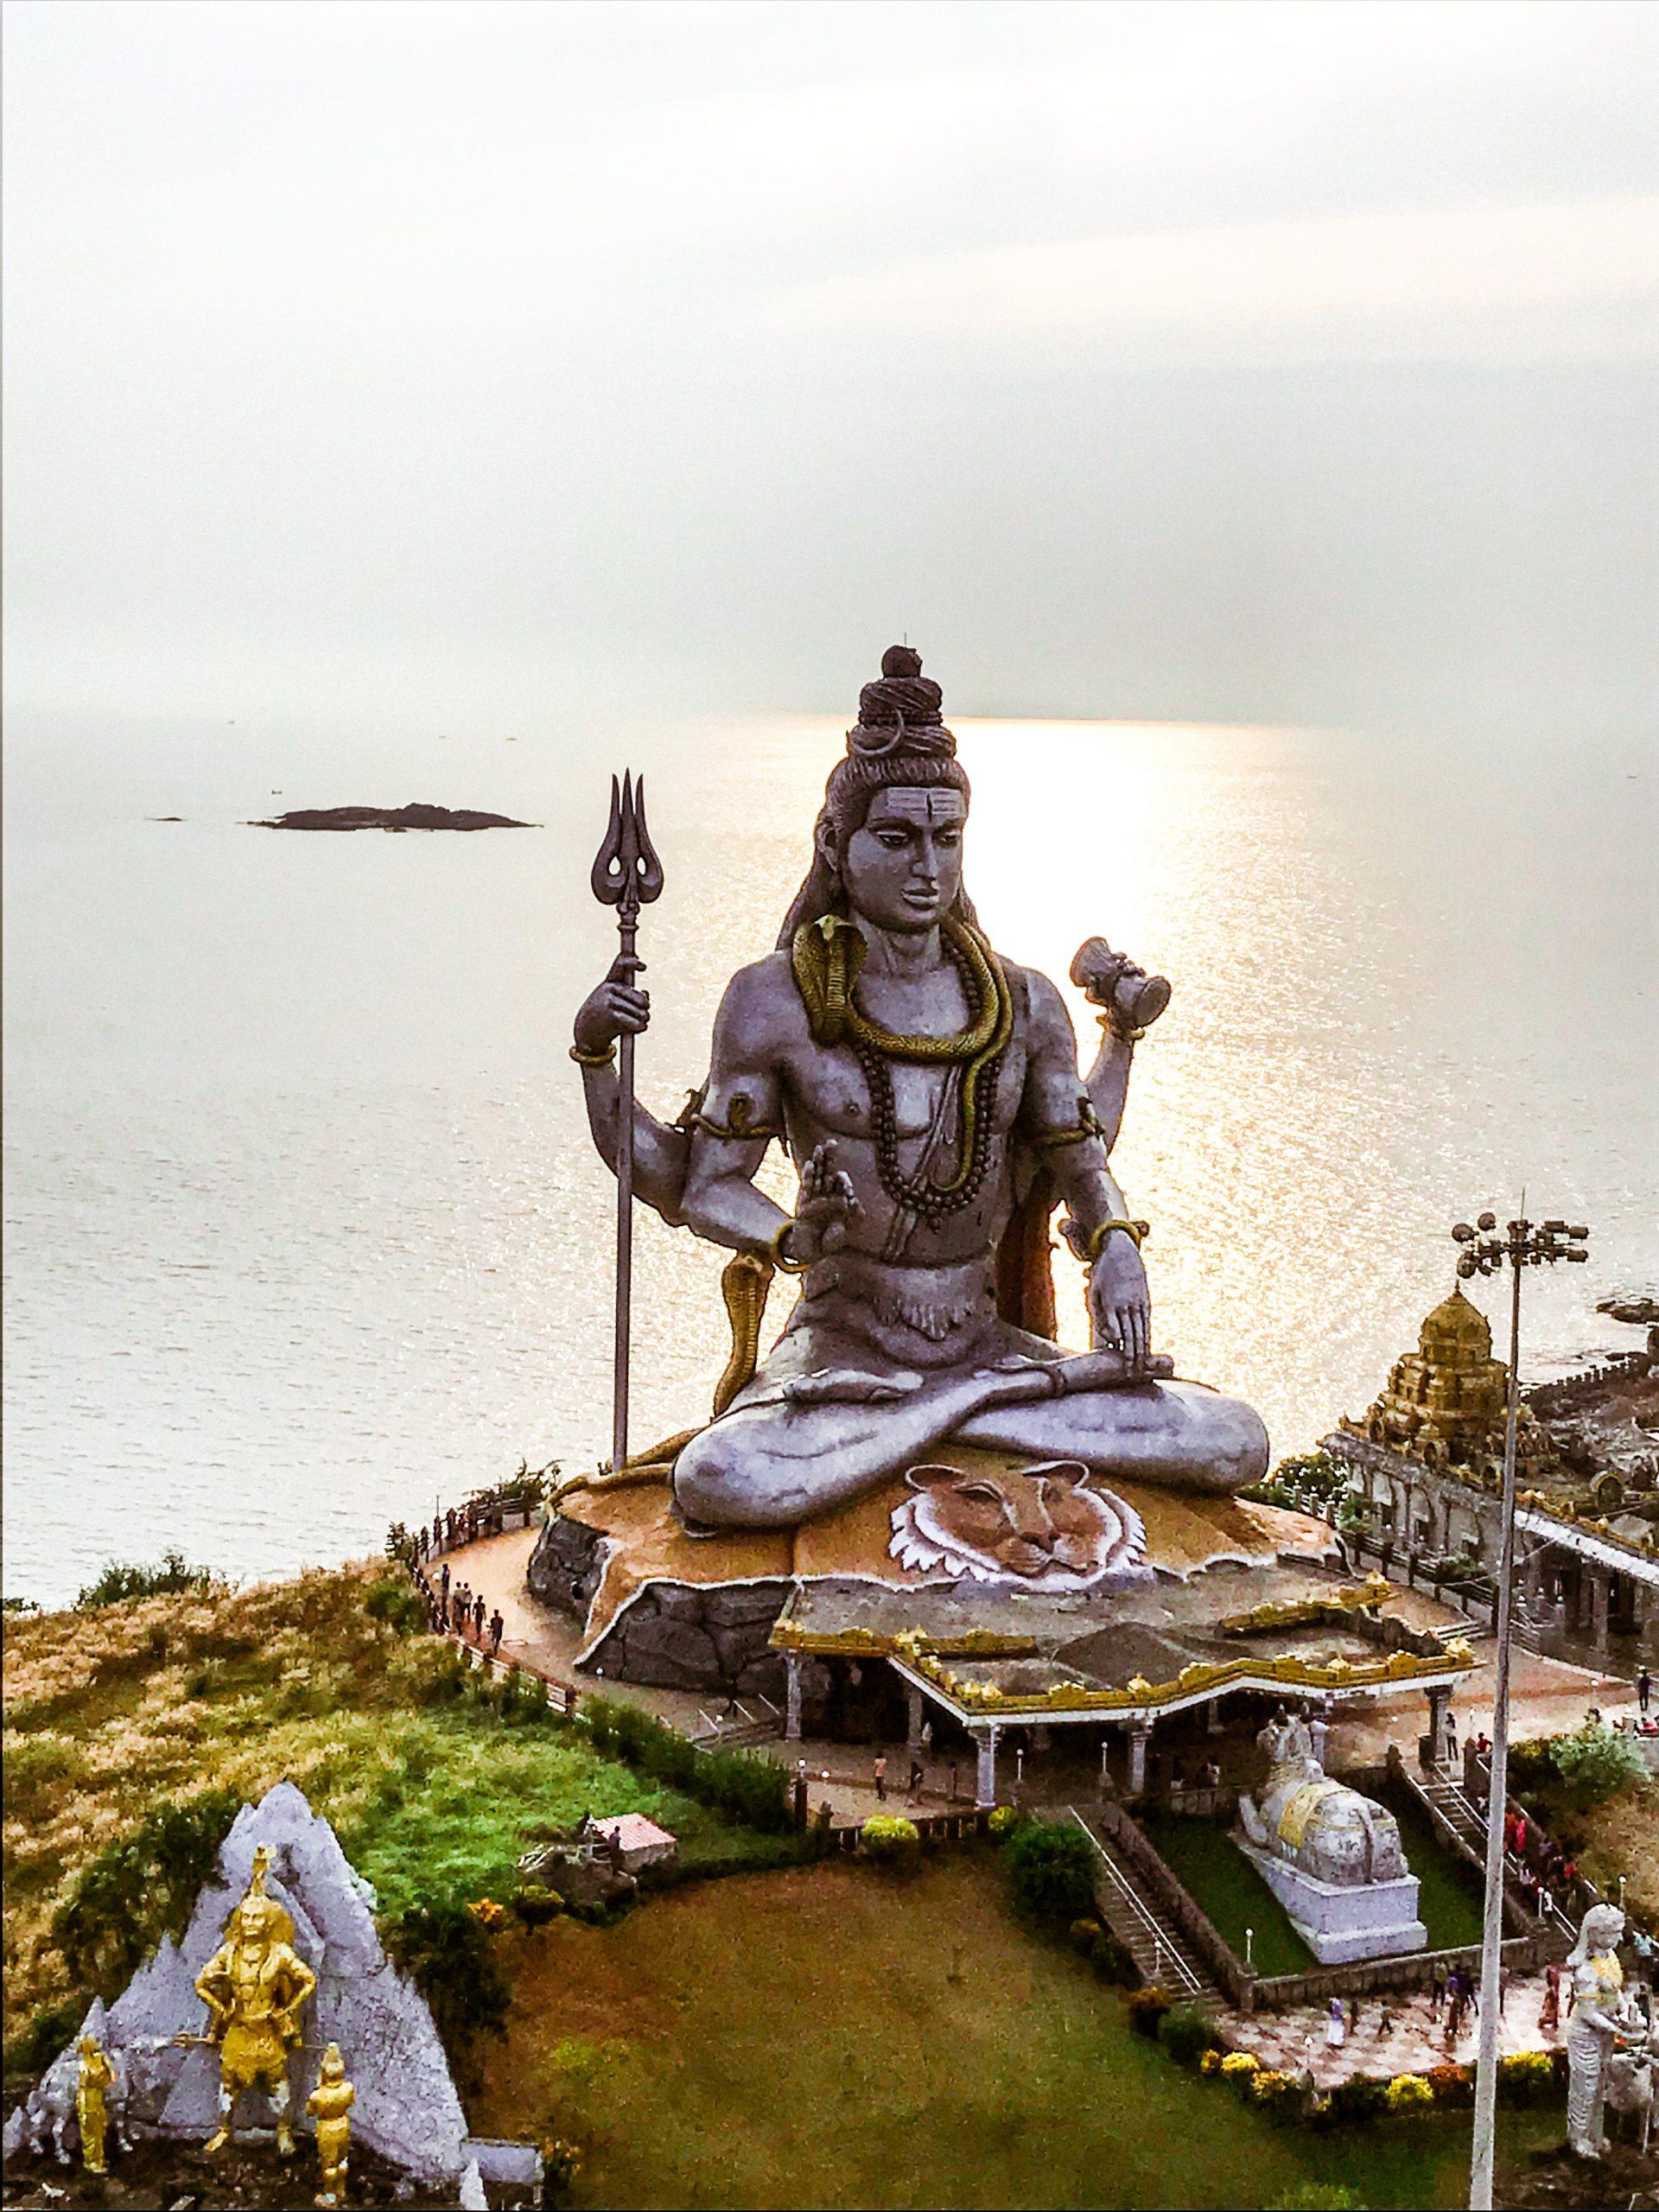 Statue and temple of lord Shiva in Murudeshwar, India.